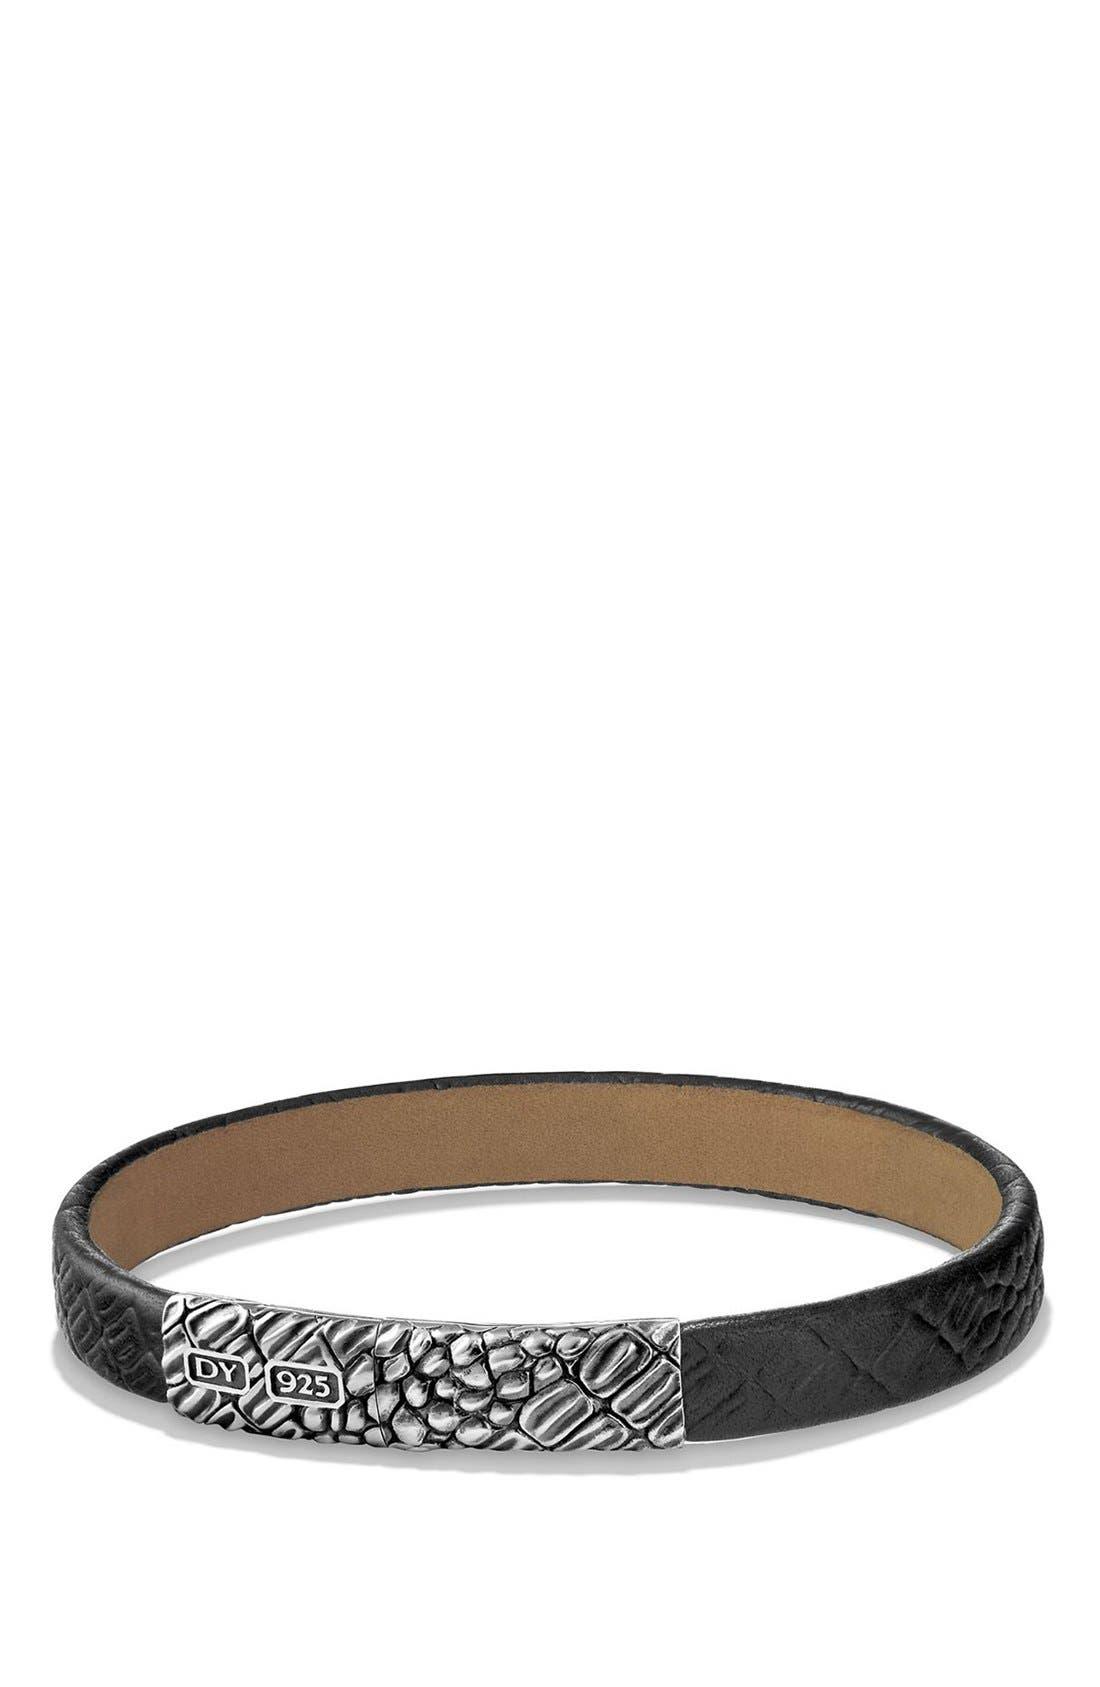 Gator Leather Bracelet,                             Main thumbnail 1, color,                             001